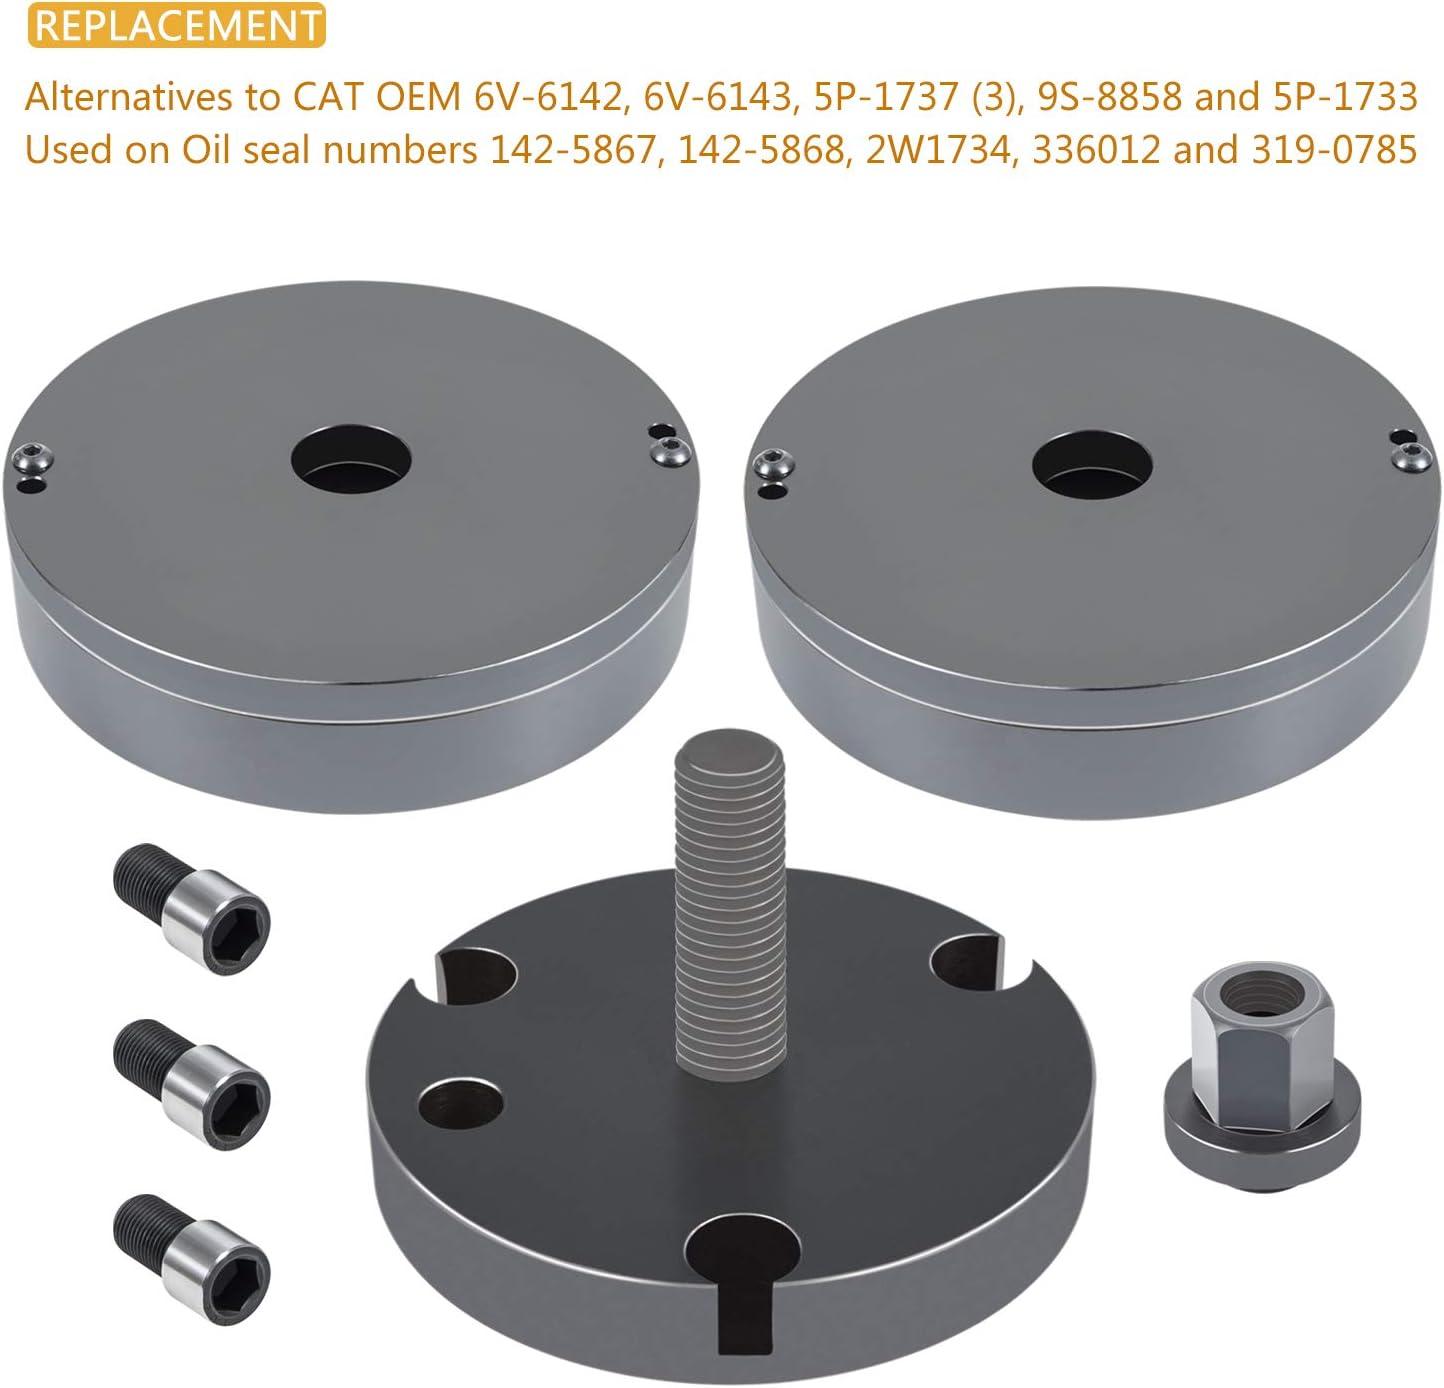 Diesel Front /& Rear Crankshaft Seal//Wear Sleeve Installer for CAT 3406 3408 C-15